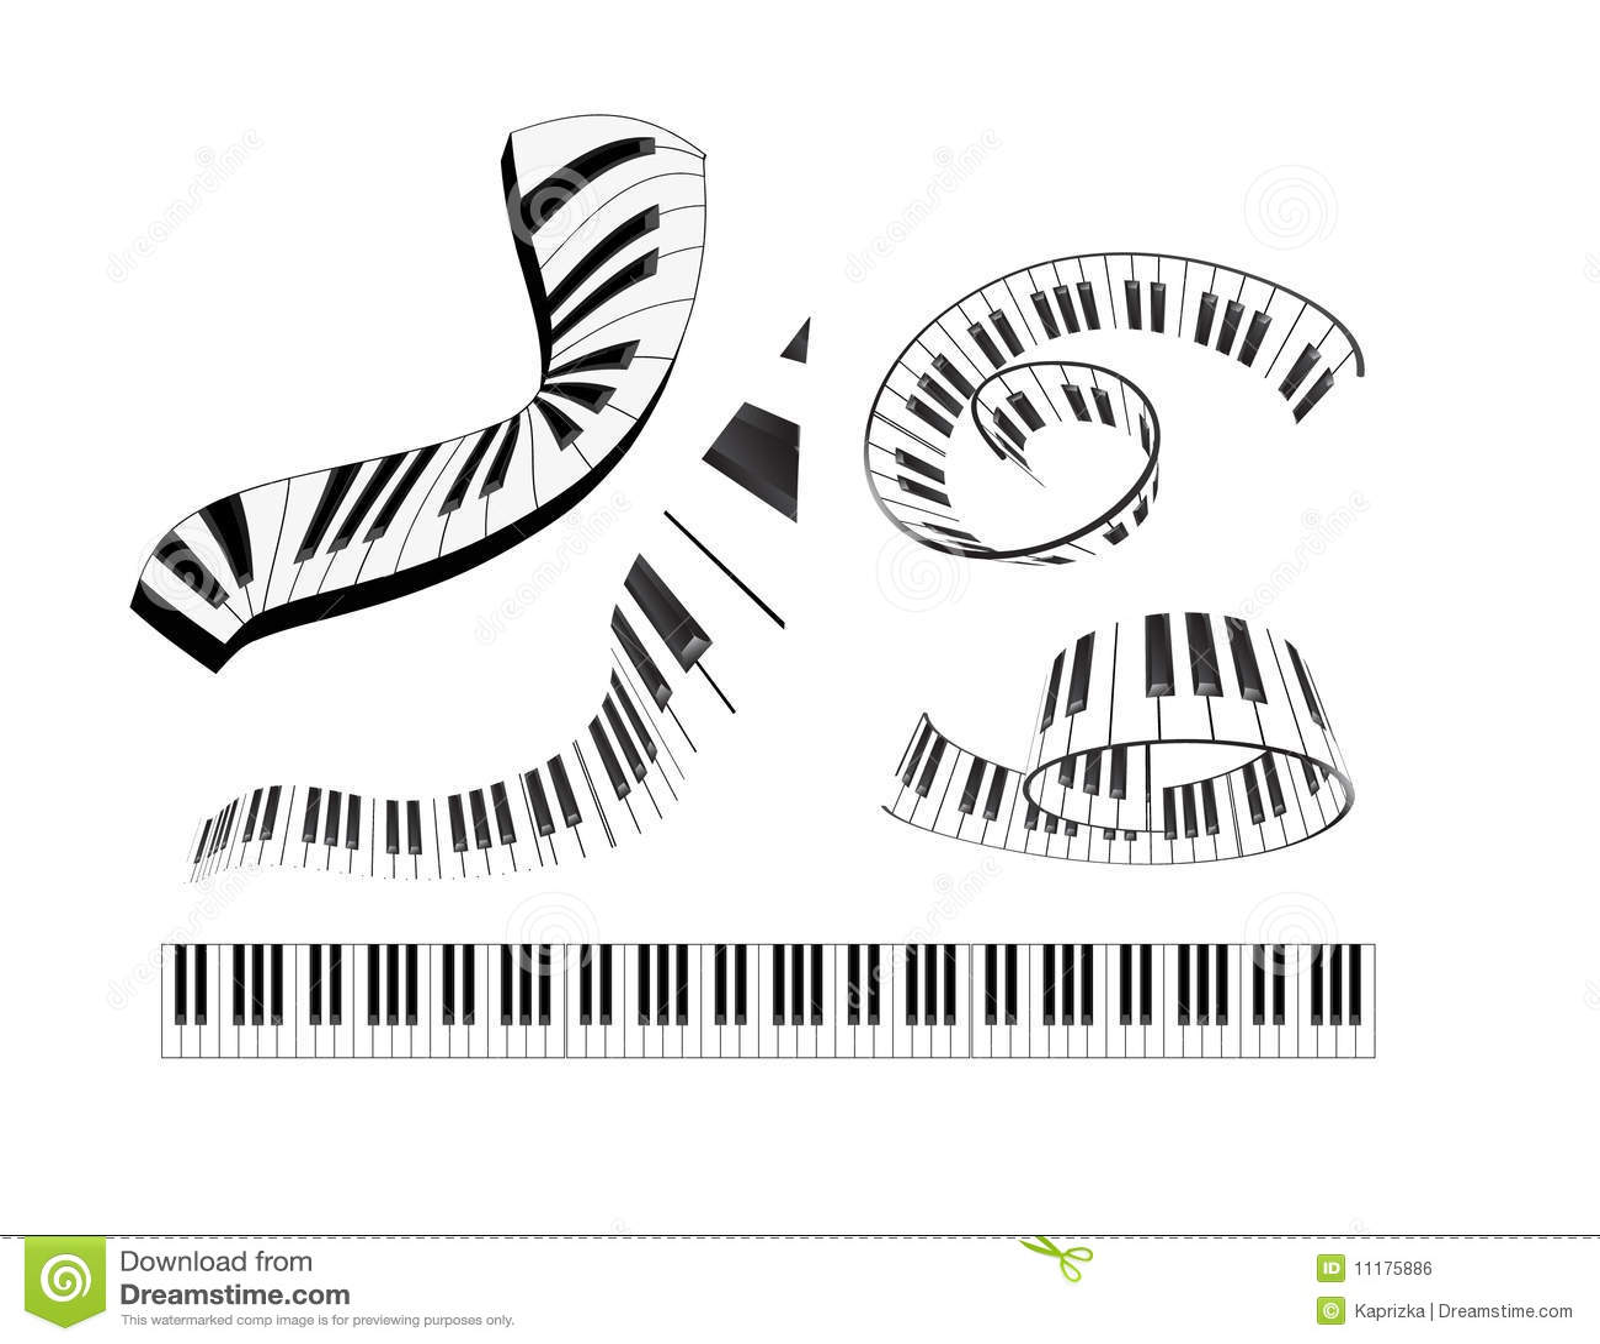 Set Of Abstract Piano Keyboard Royalty Free Stock Image